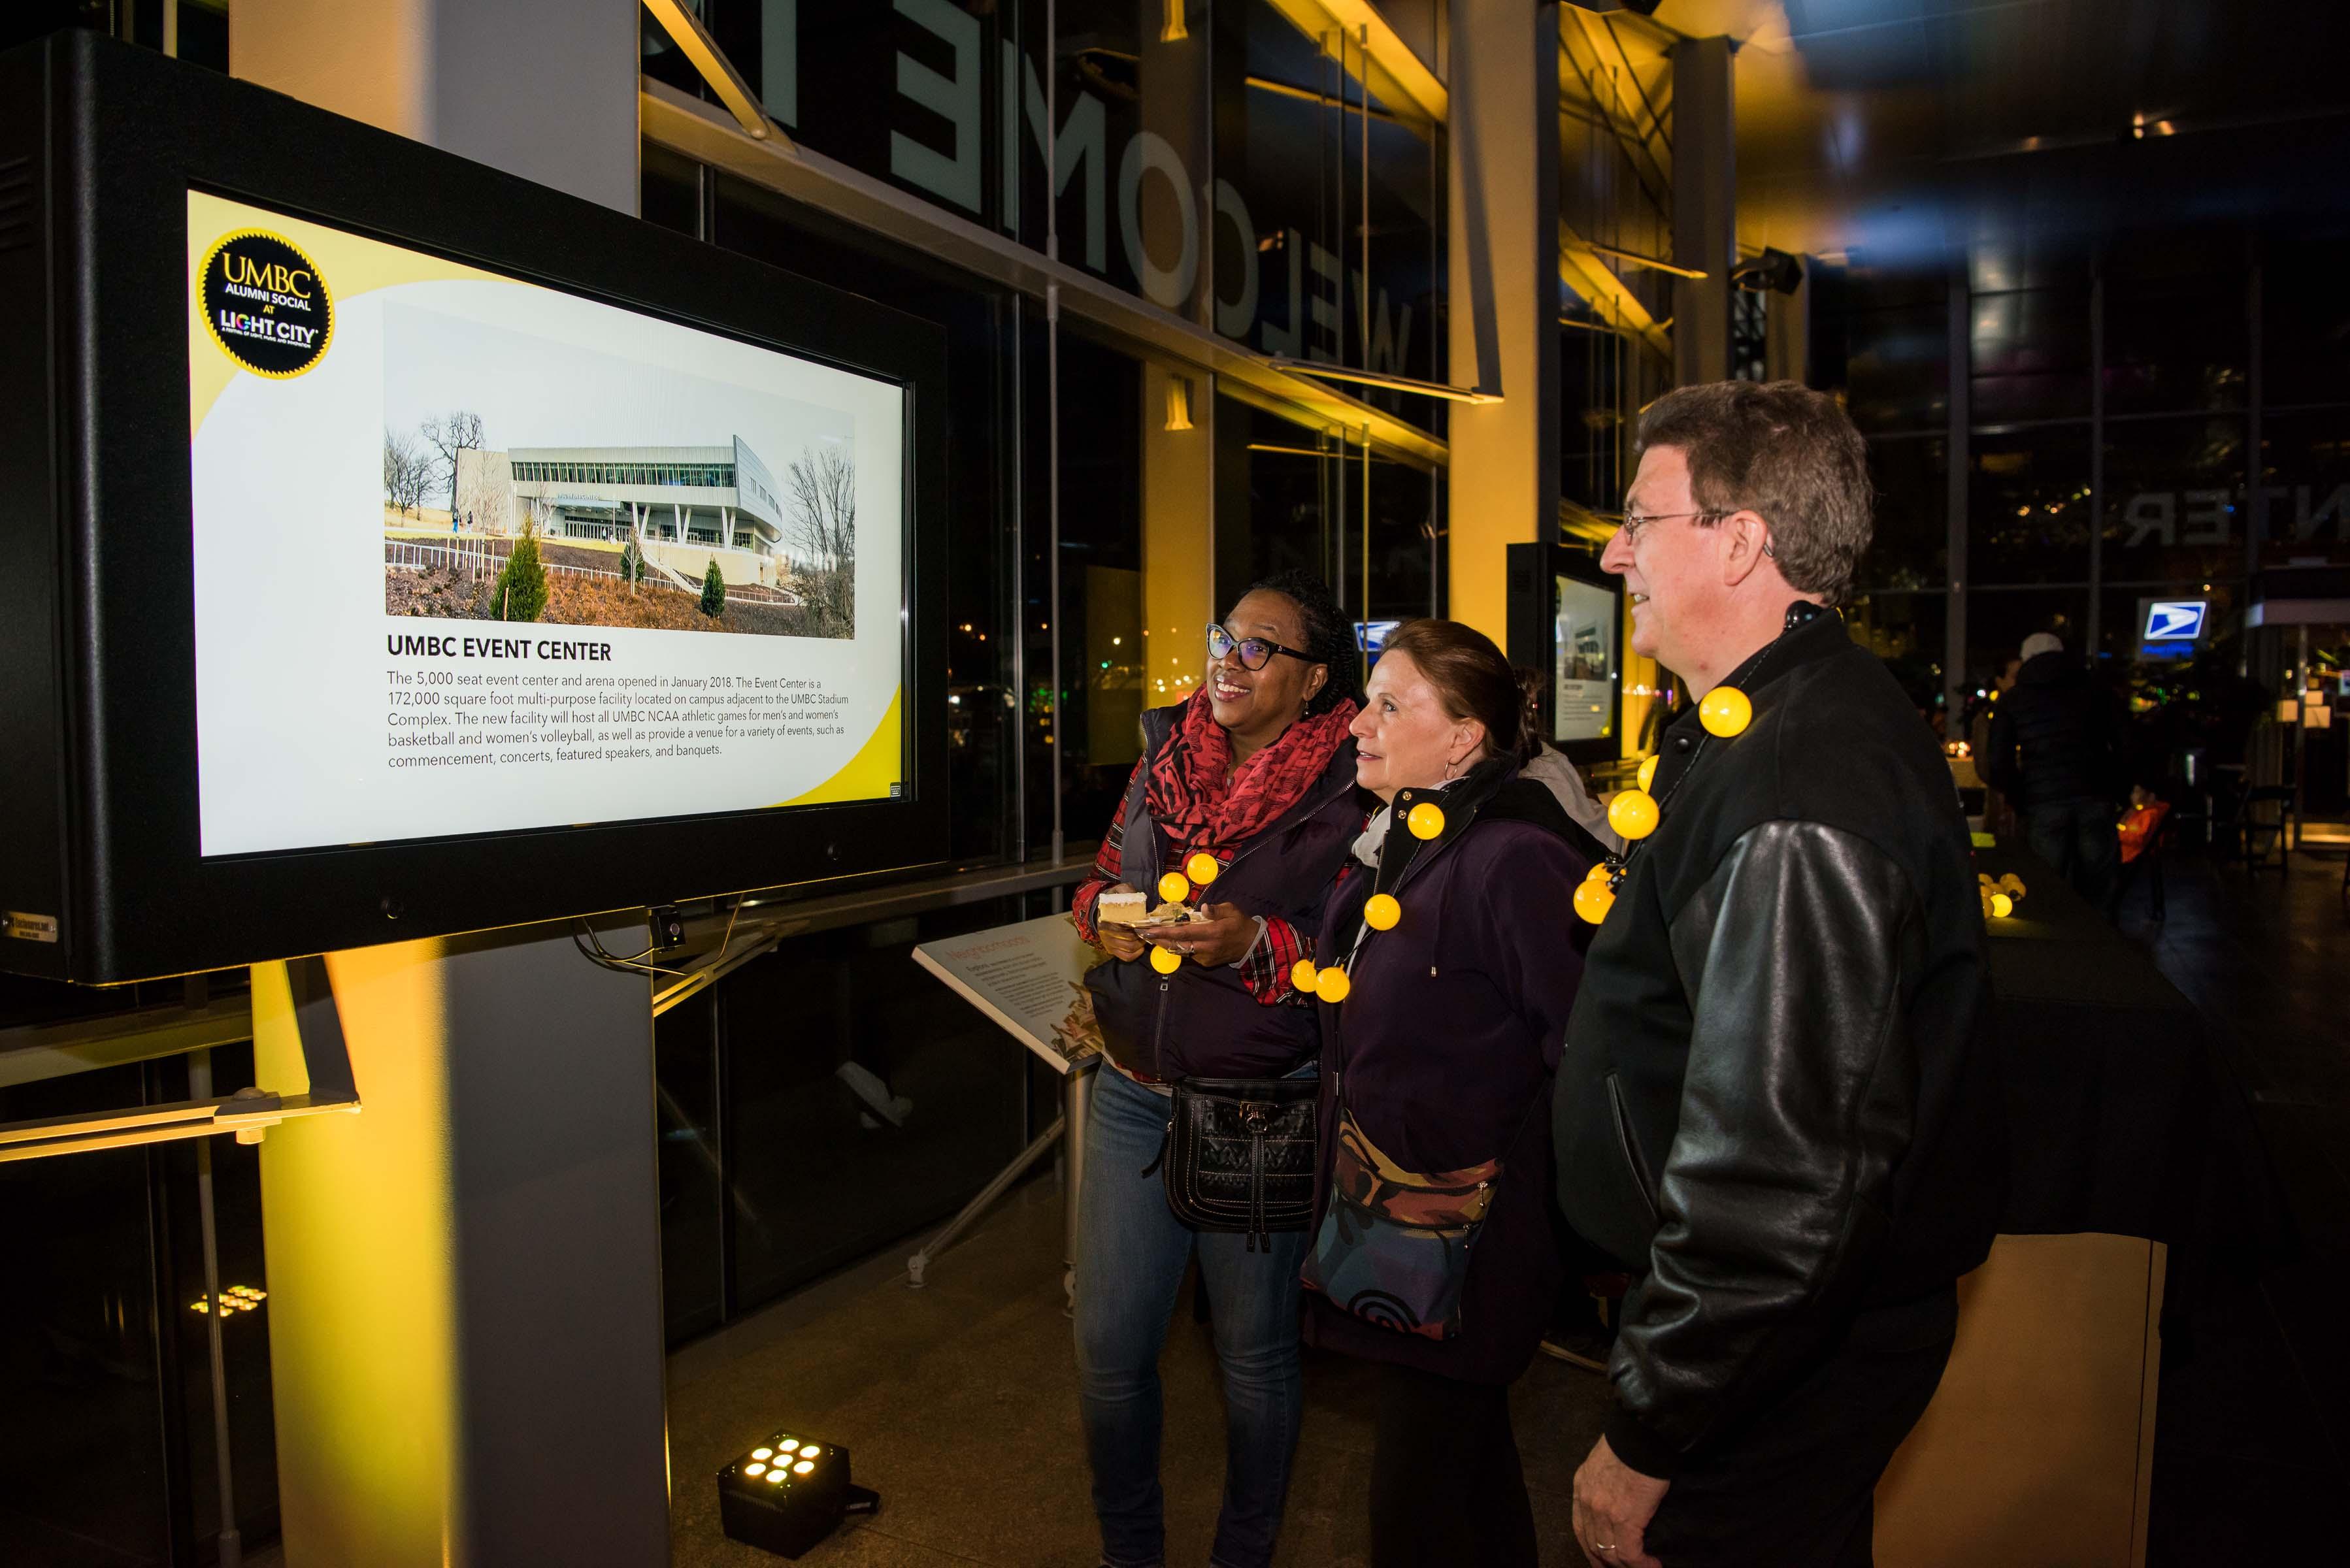 Group looks at UMBC event center slide on screen